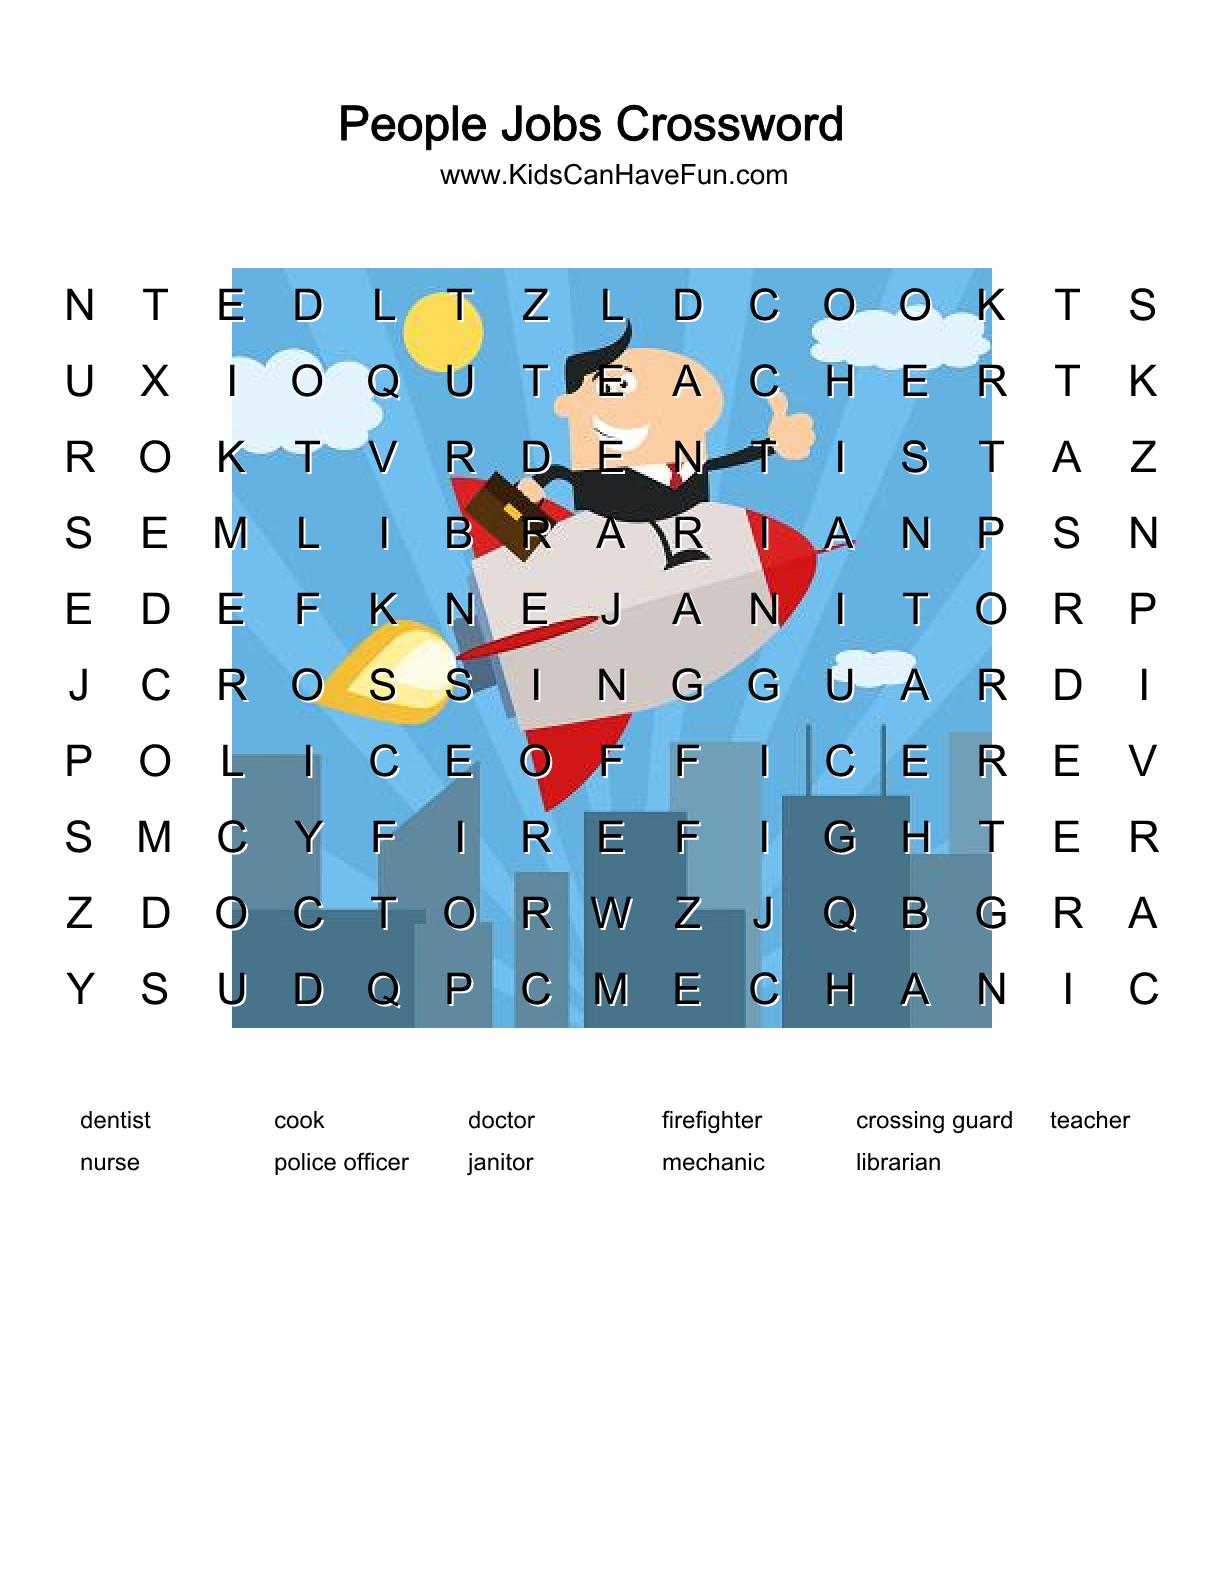 Psychology Crossword Puzzle Printable Crossword Puzzle Gallery ...